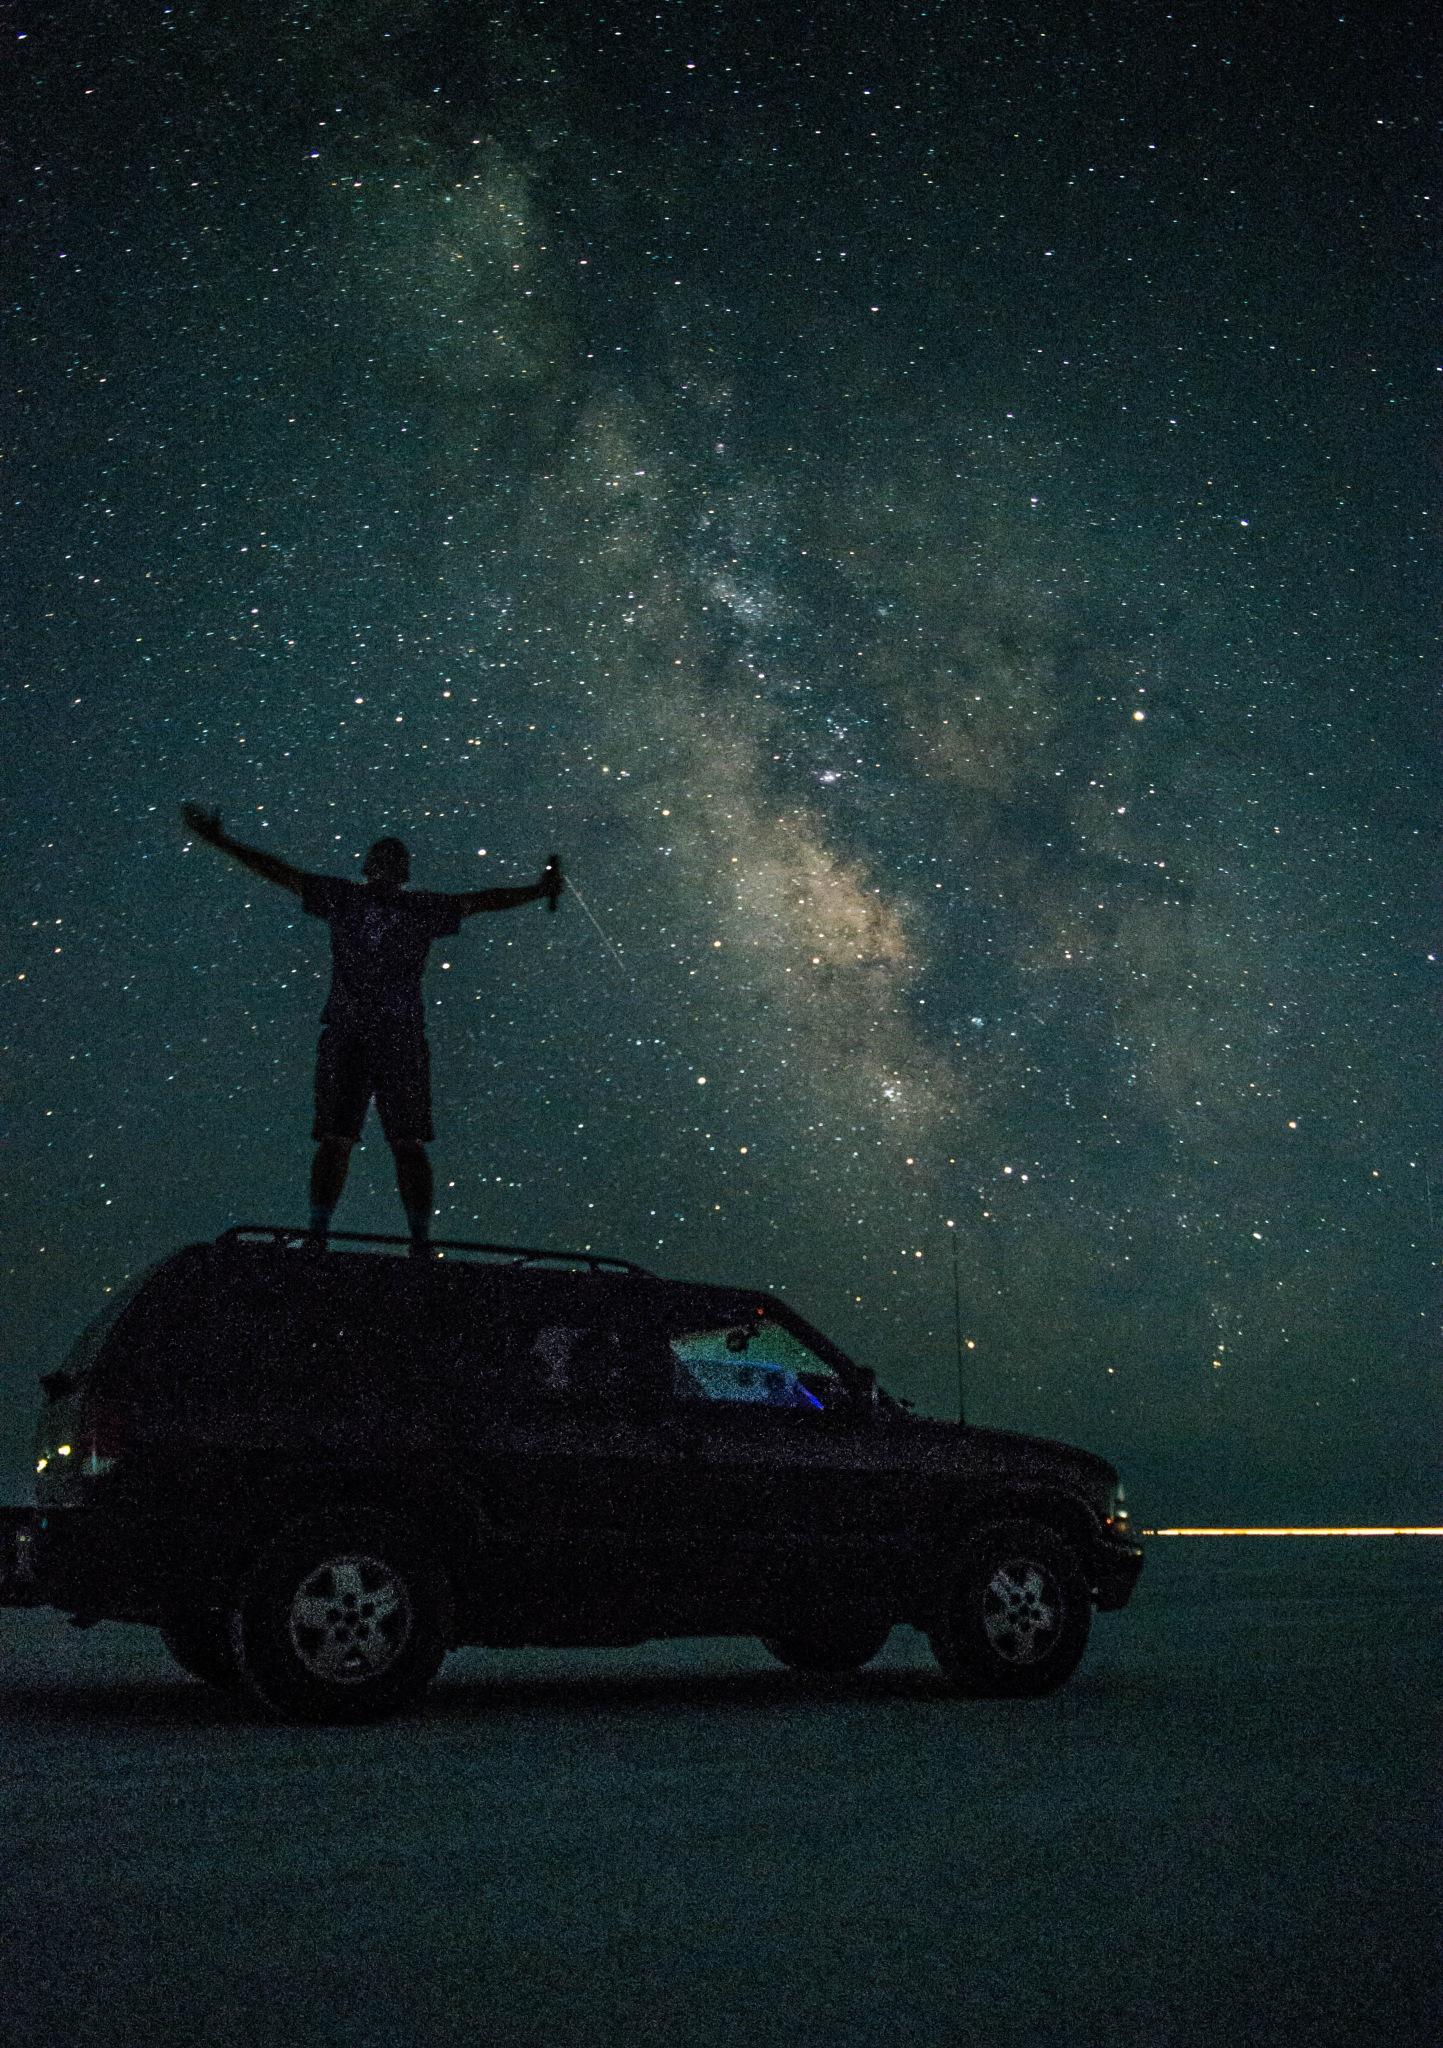 The reach by Alec Jordan